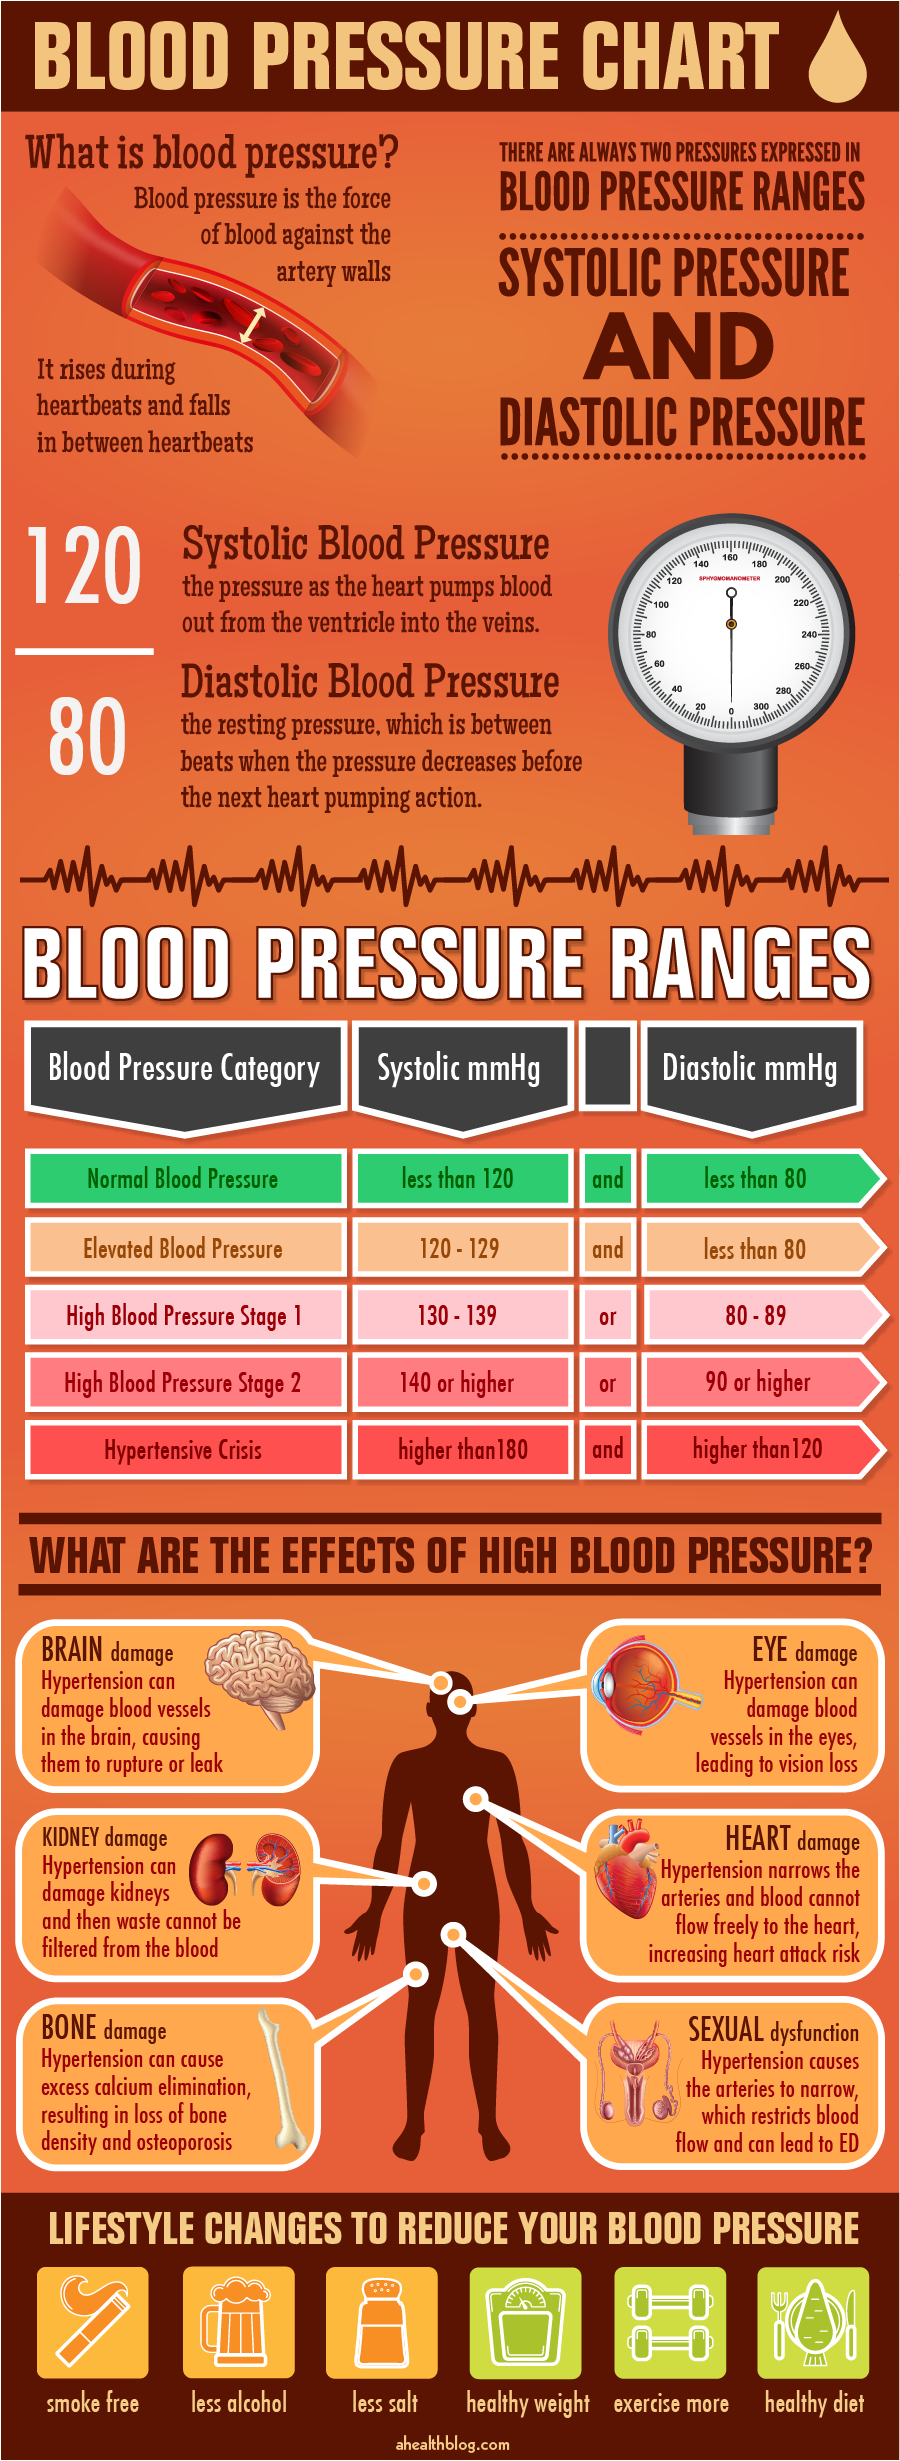 Blood Pressure Chart by ahealthblog on DeviantArt